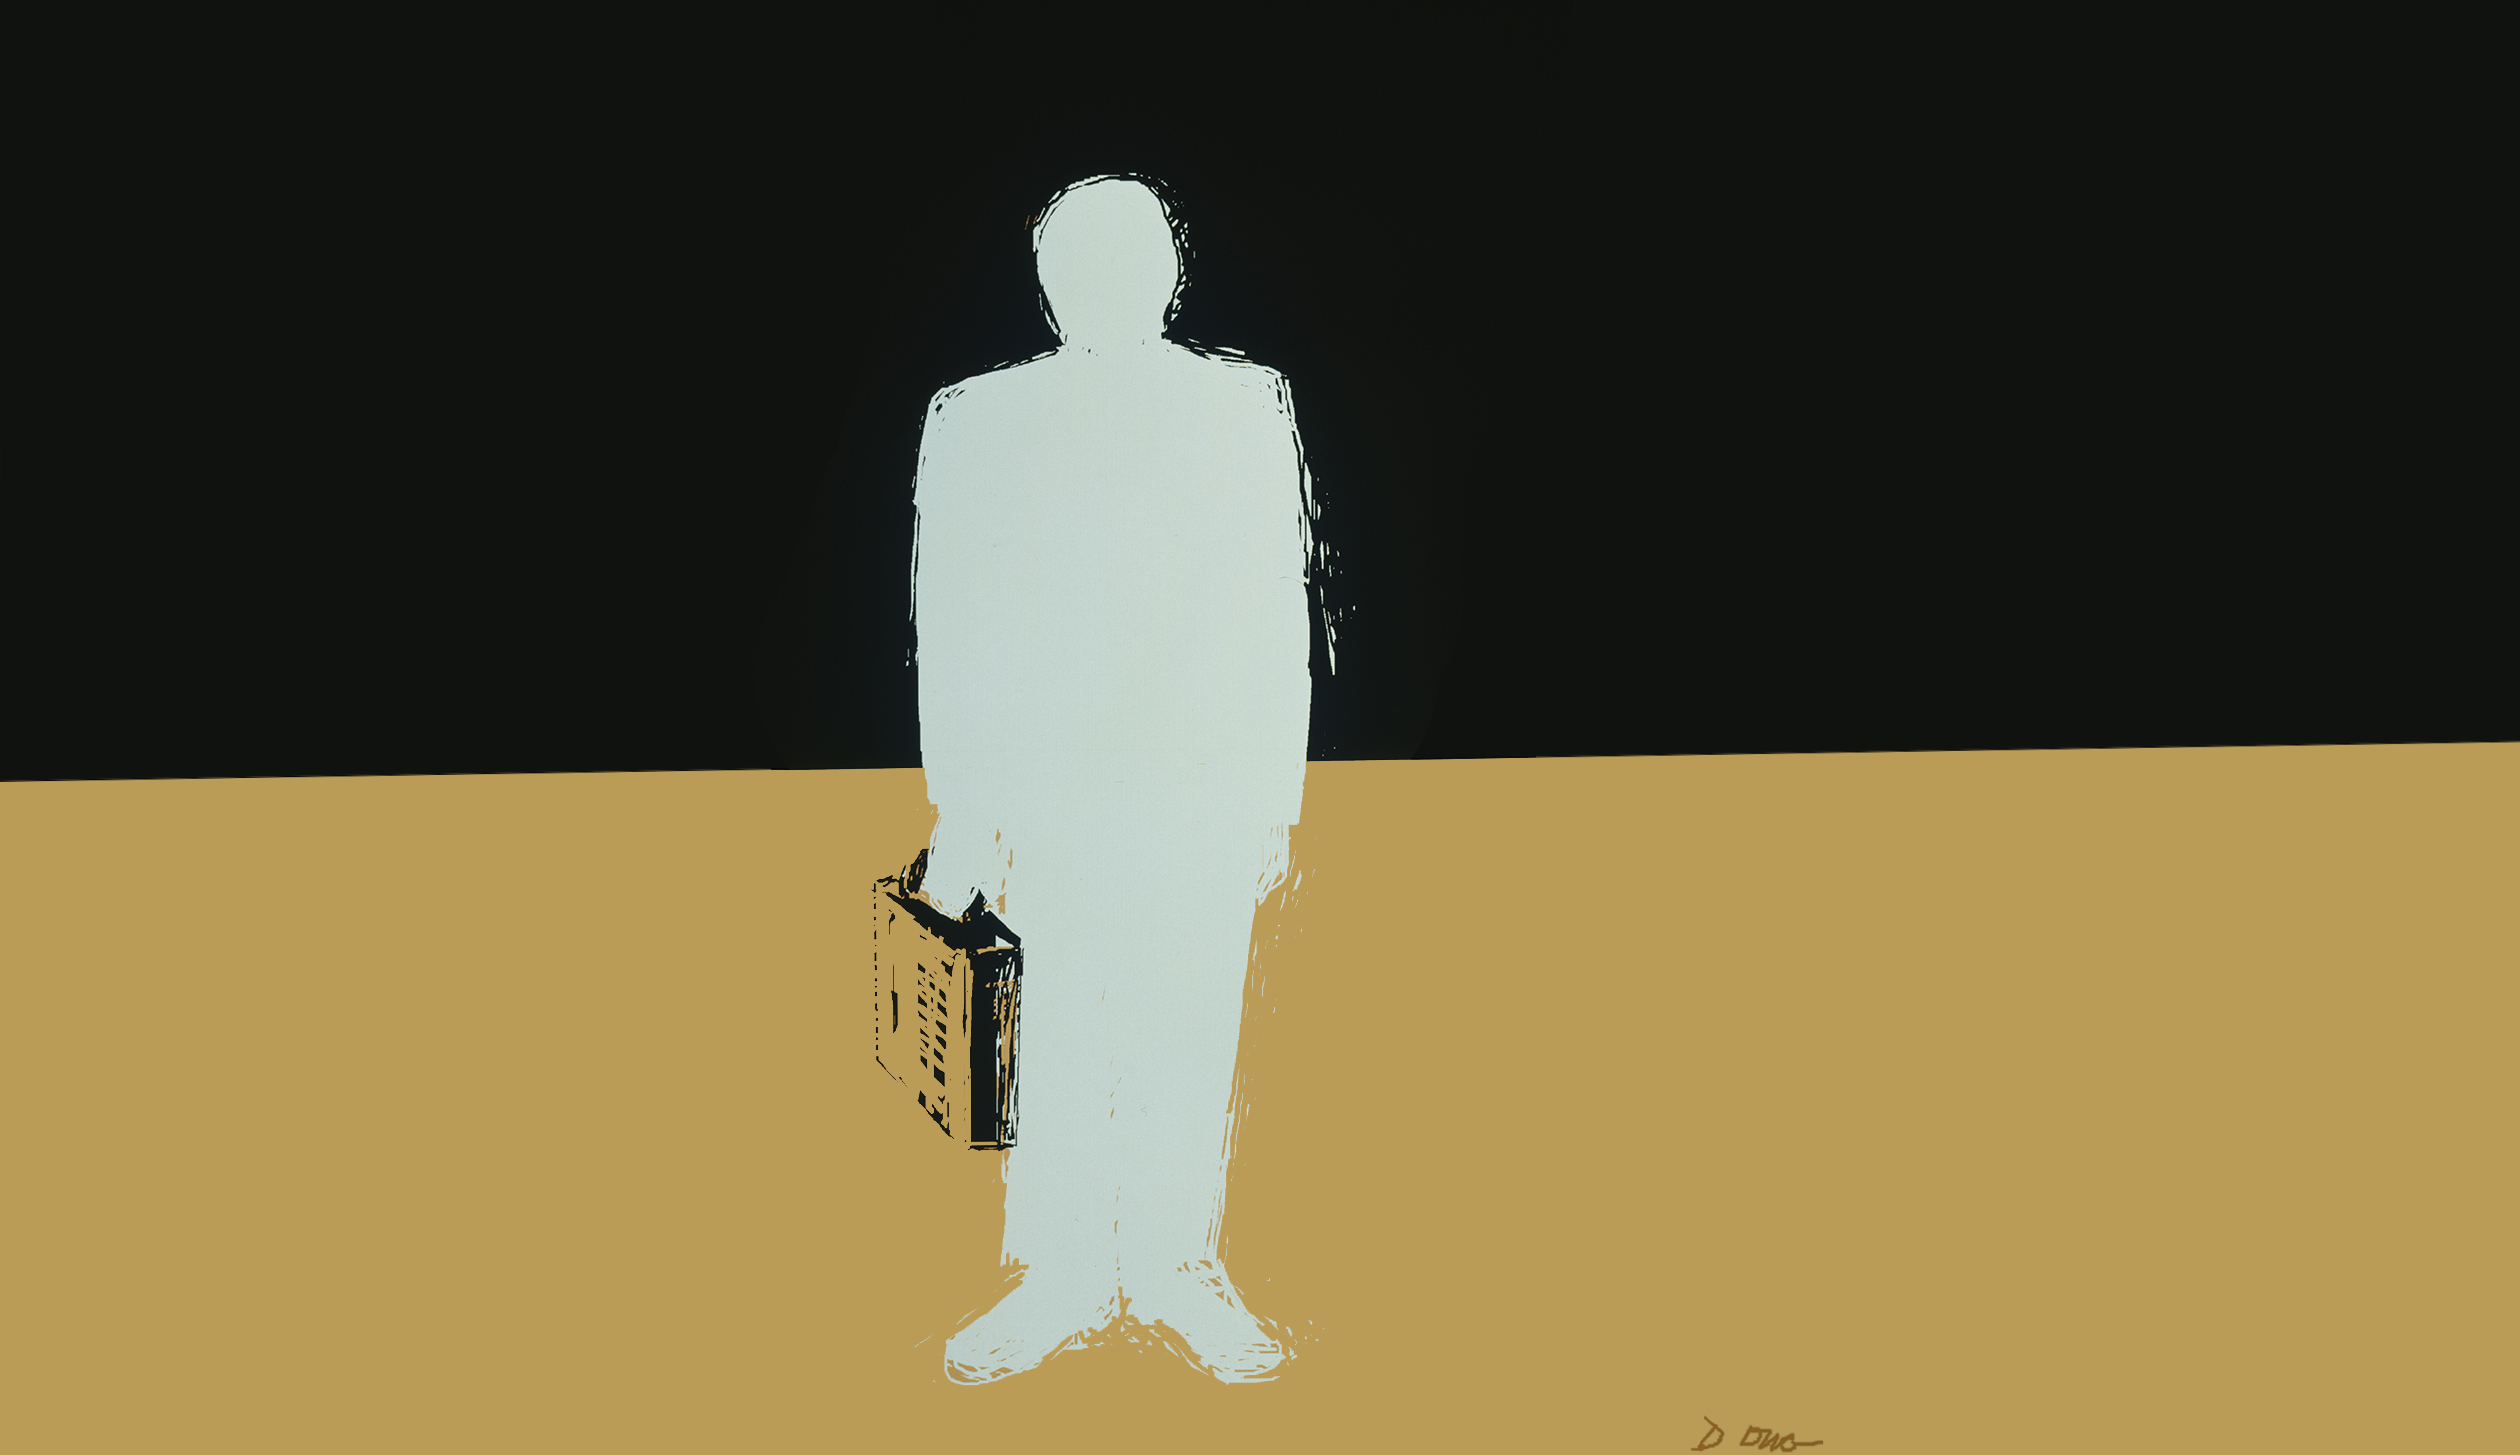 Invisible man, Diana Ong, computer graphics